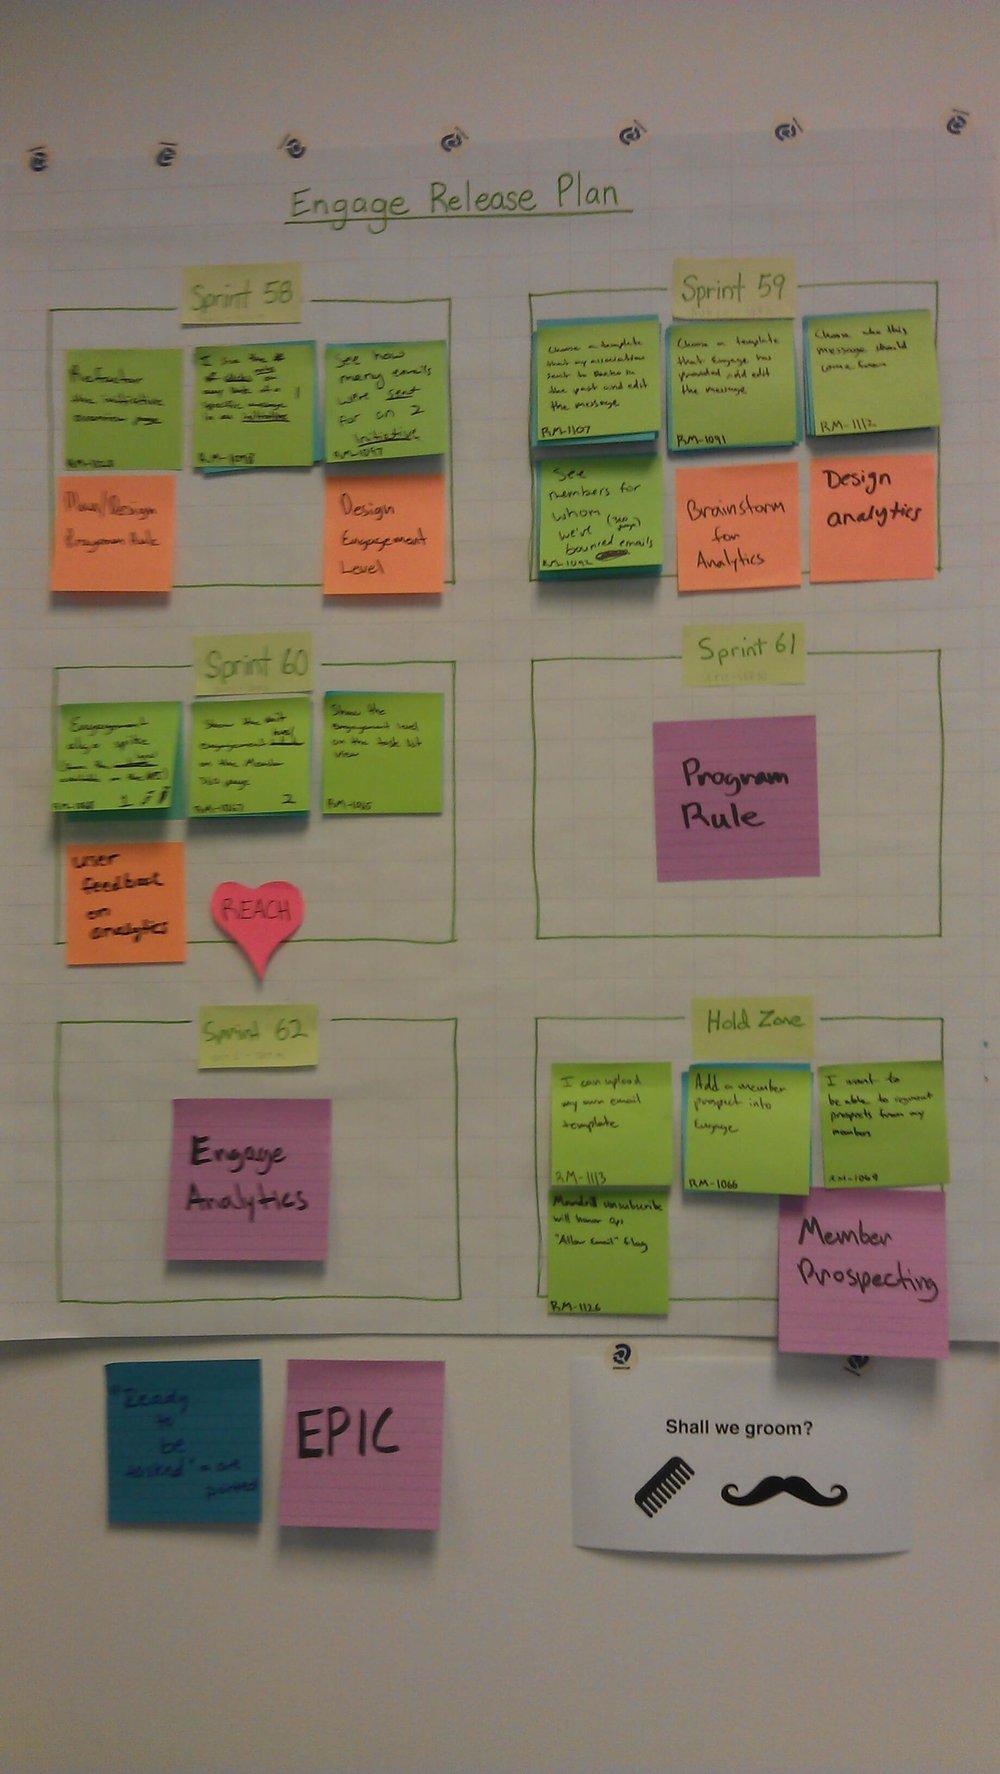 Agile UX planning